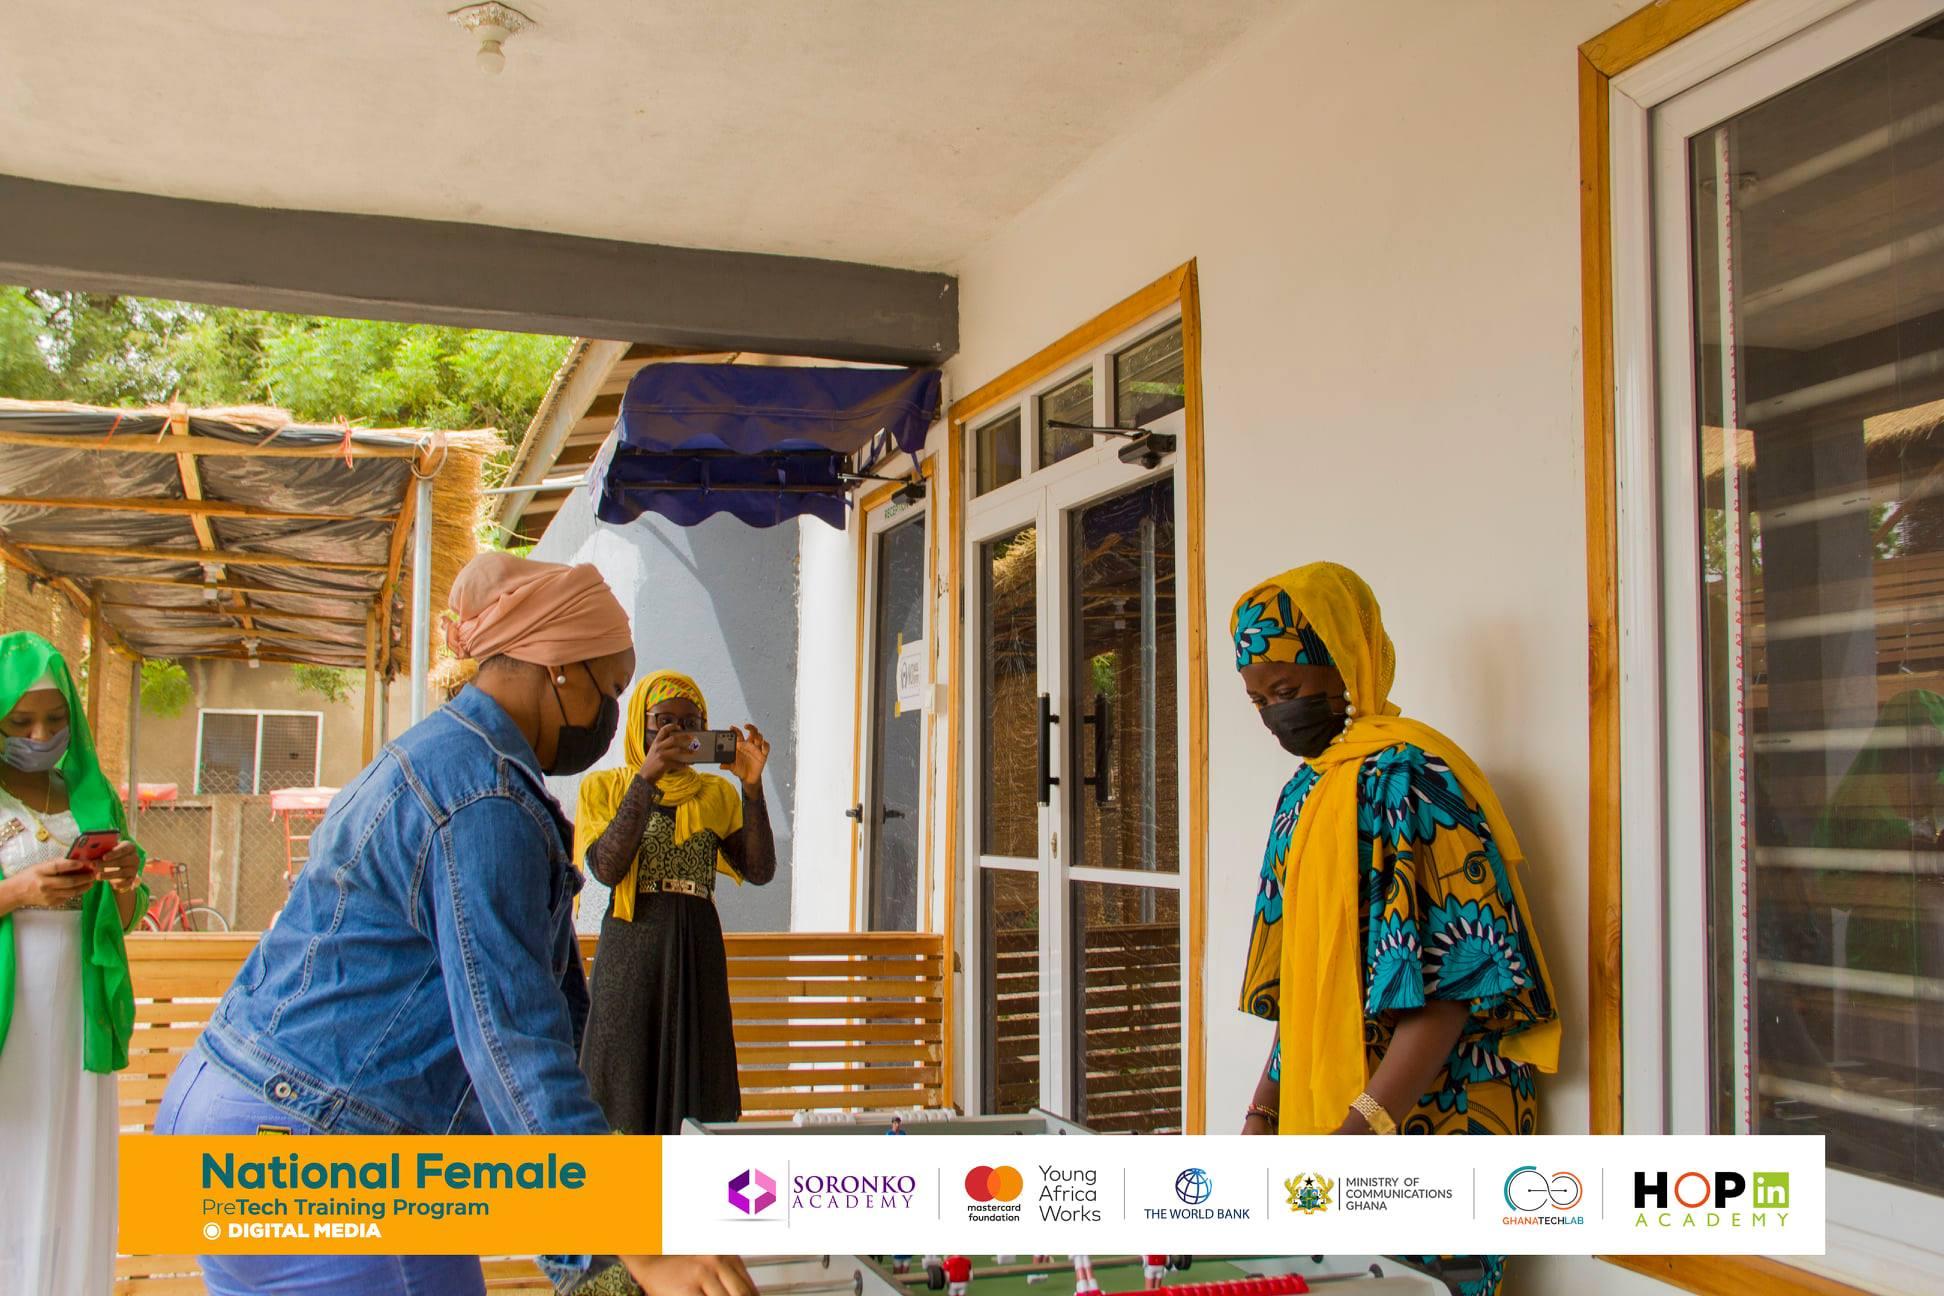 30 Ladies Trained on Digital Media in Tamale